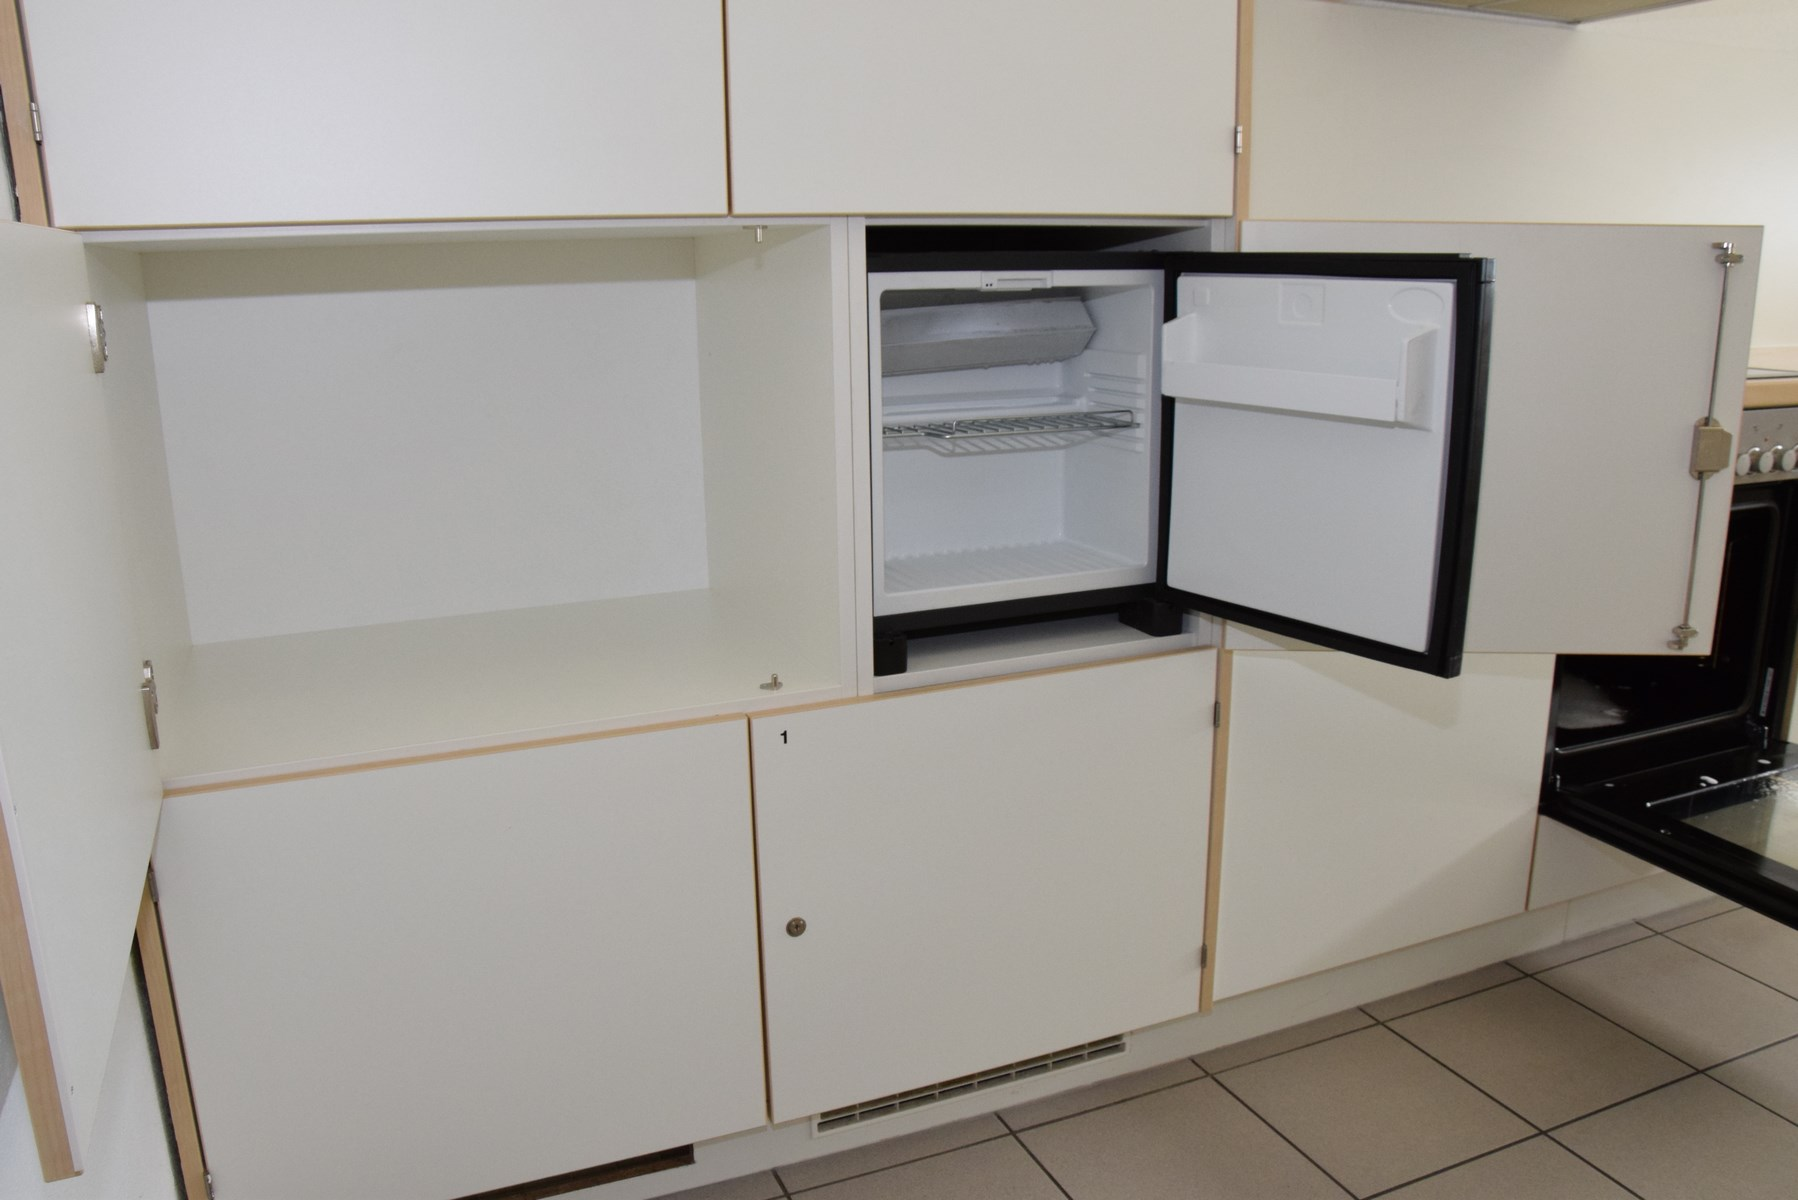 Mini Kühlschrank Hofer : Personalwohnheim